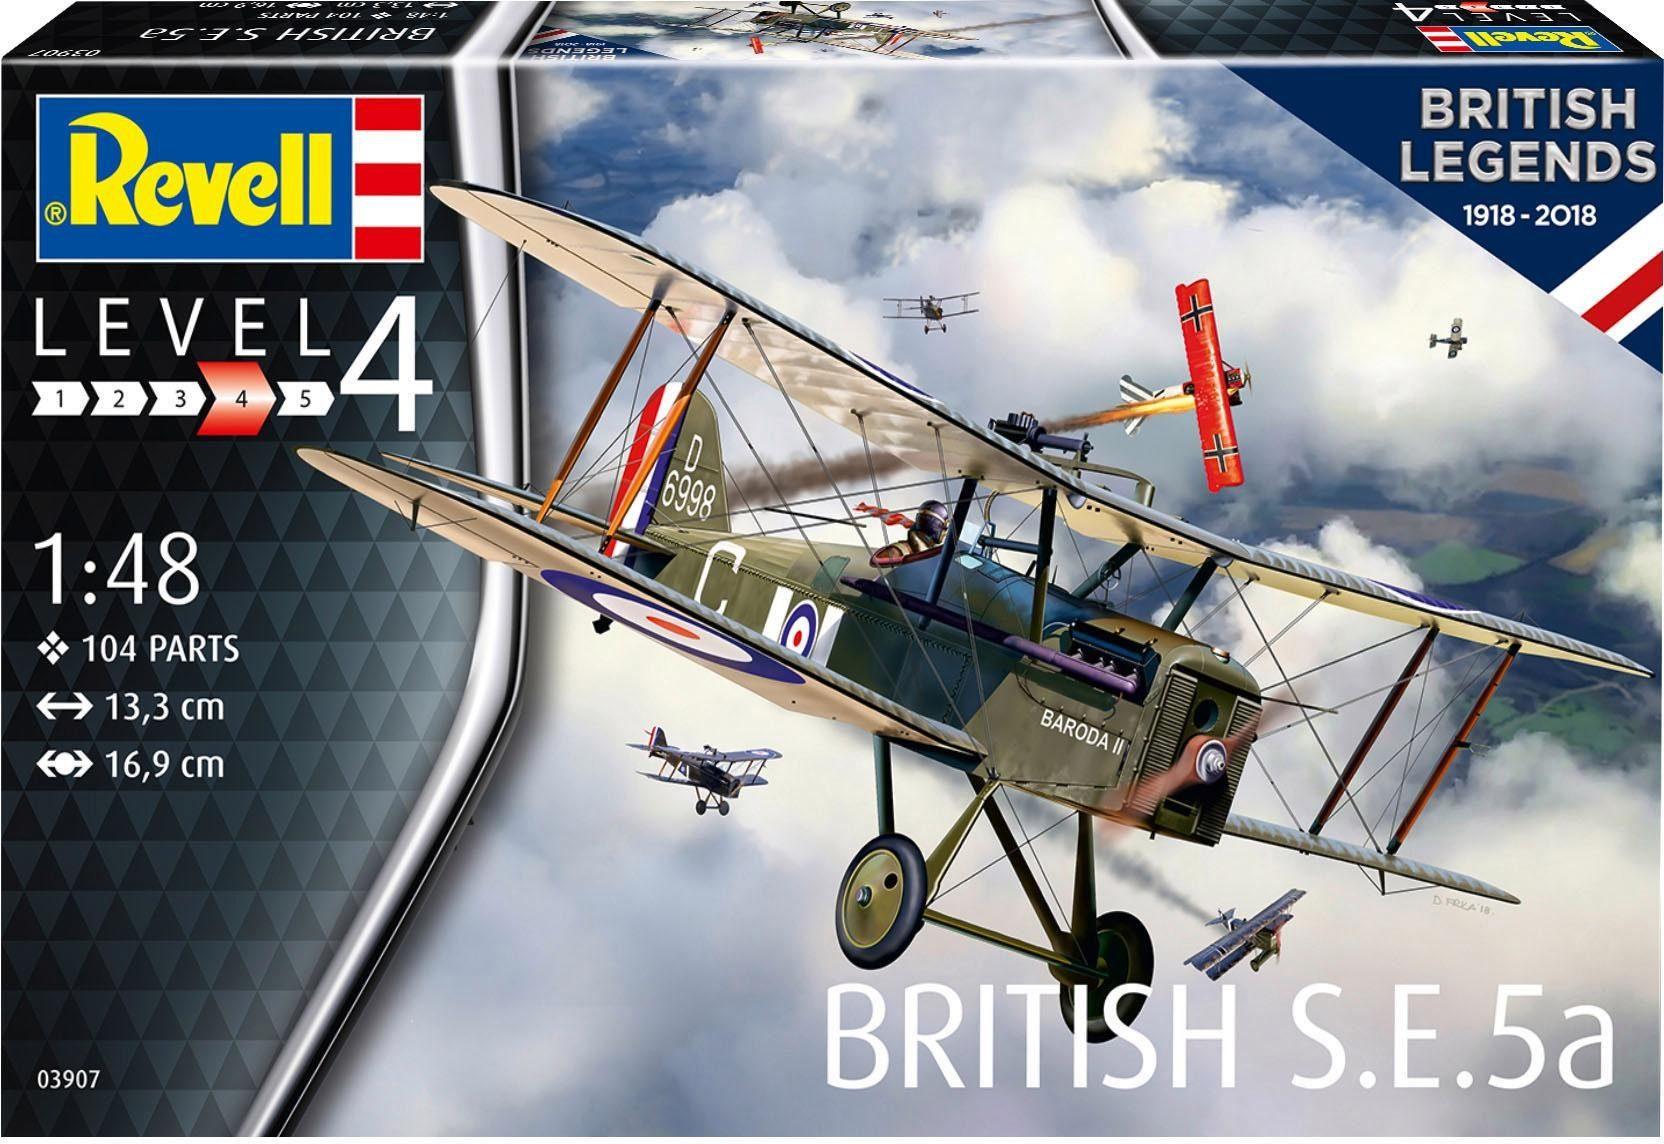 Revell Modellbausatz Flugzeug, Maßstab 1:48, »British Legends 1918-2018, British S.E.5a«